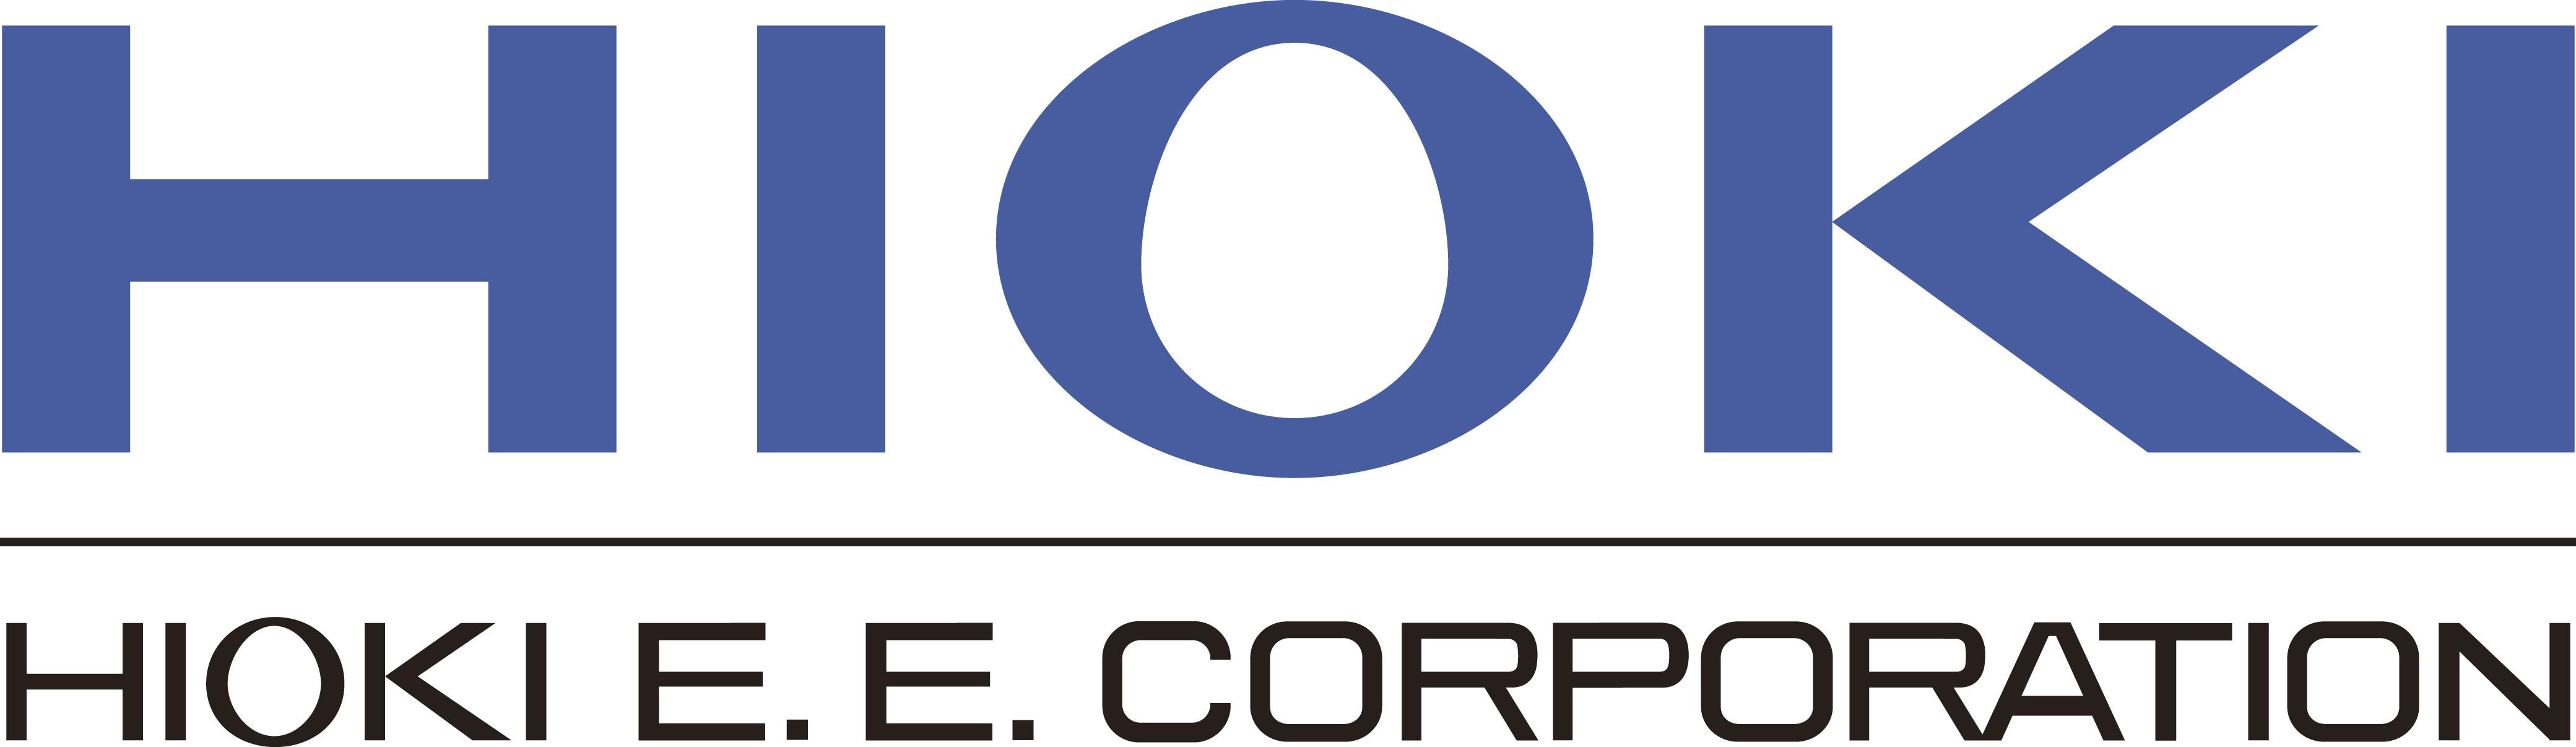 Hioki E E Corporation Formula Student Austria